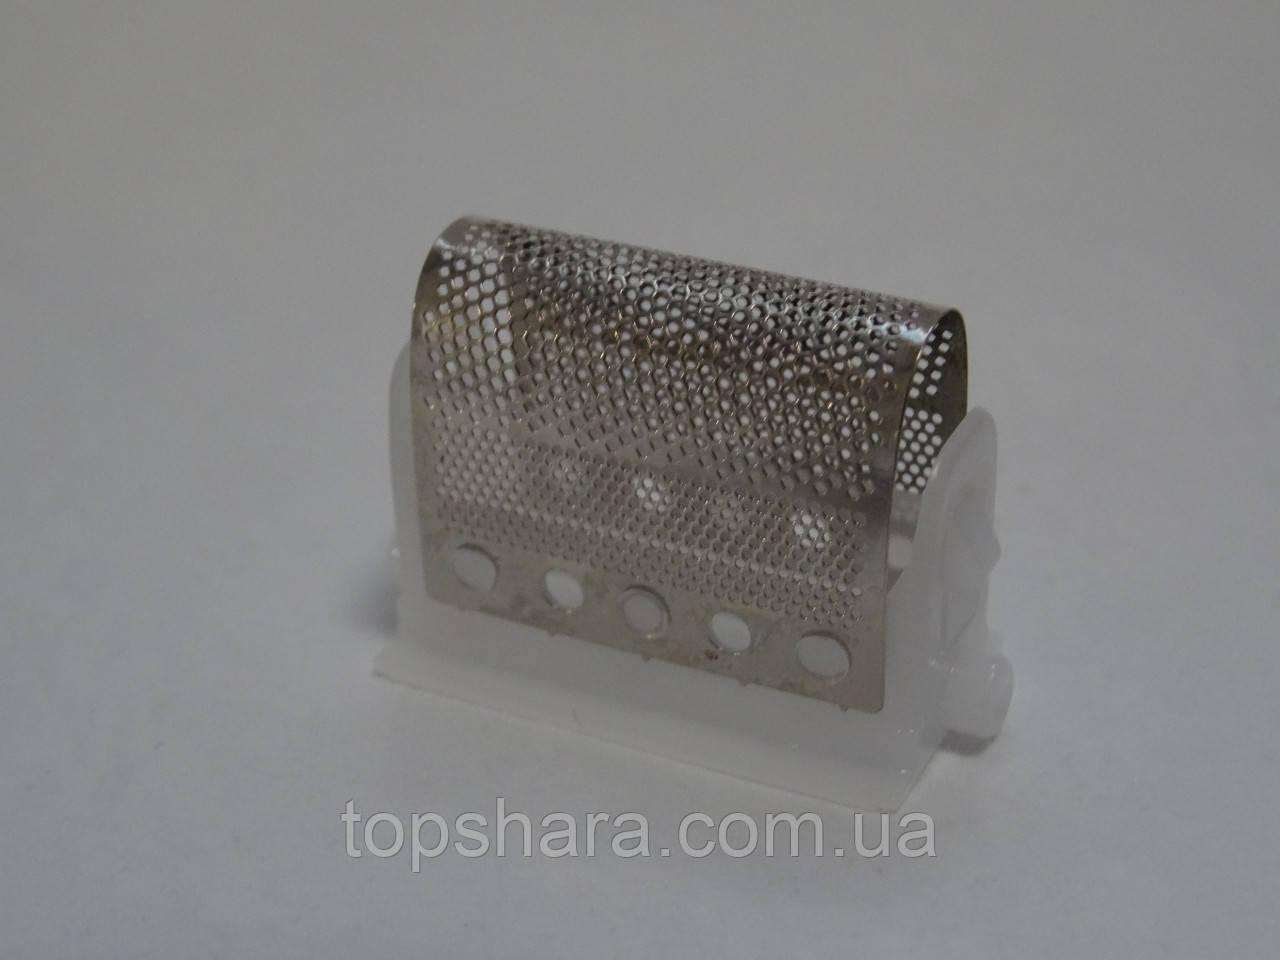 Сетка для бритья триммера Philips MG7720/15